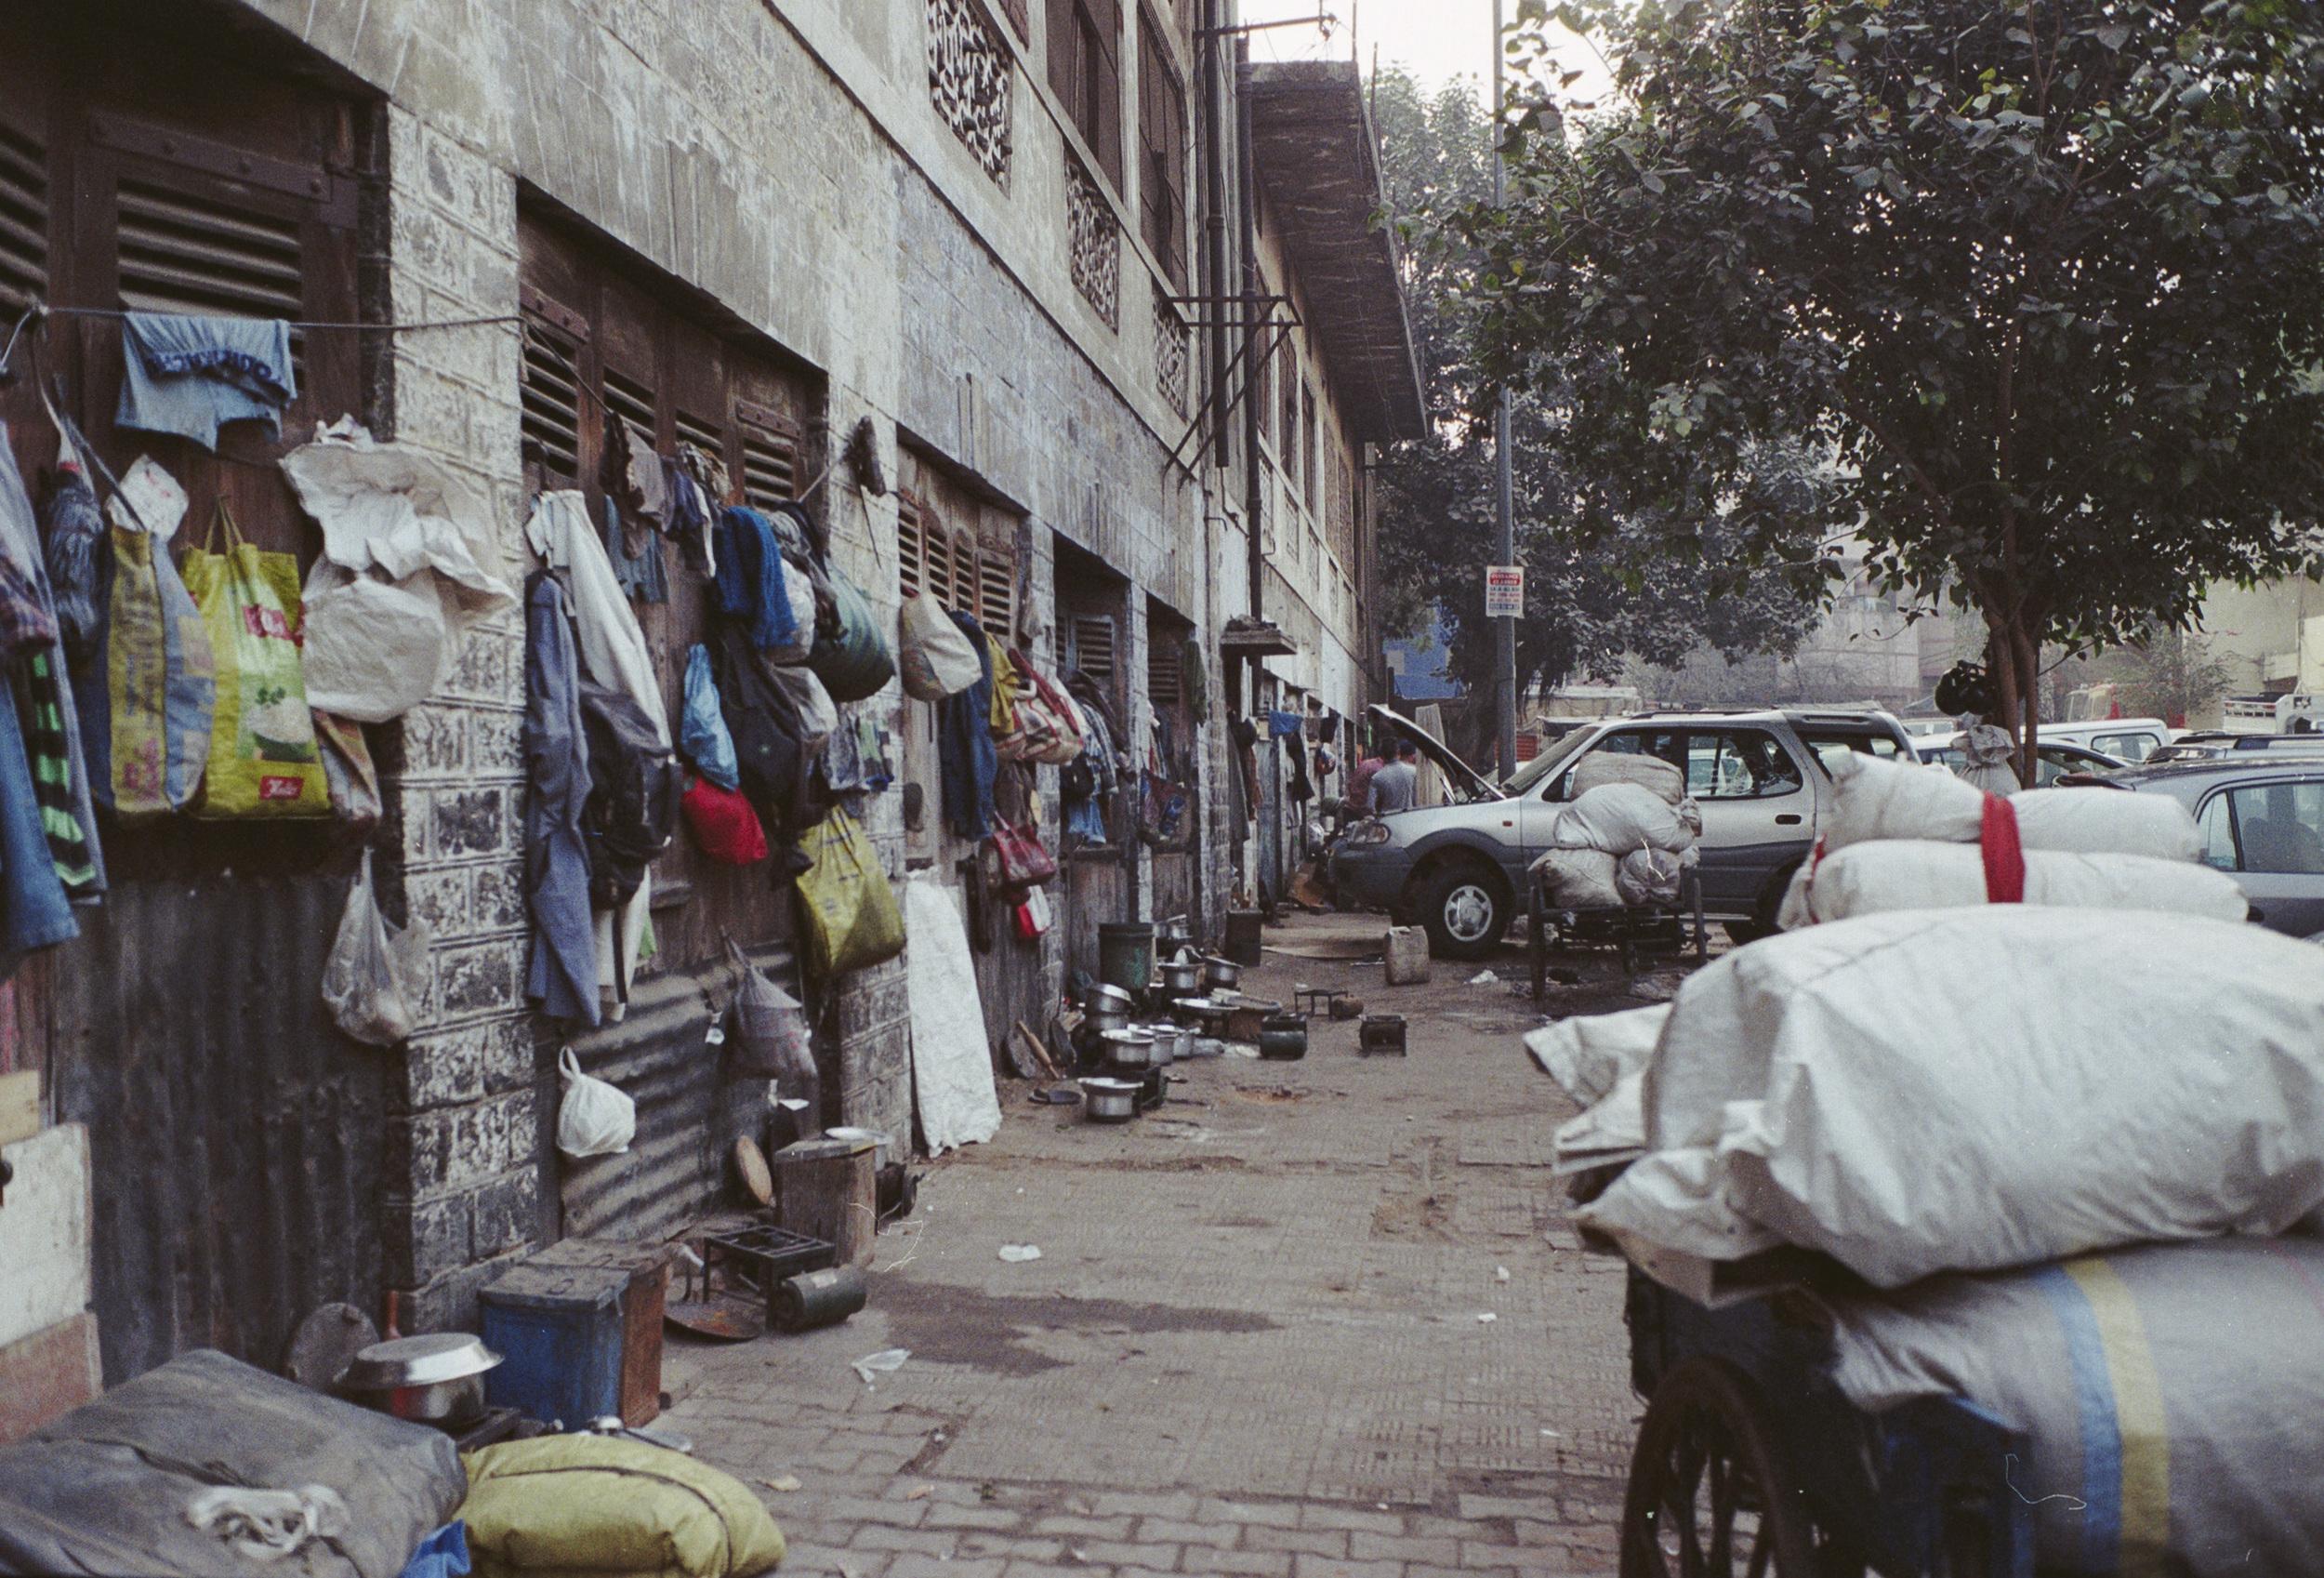 69-F32_Street Slums, Delhi, India 2016-58.jpg